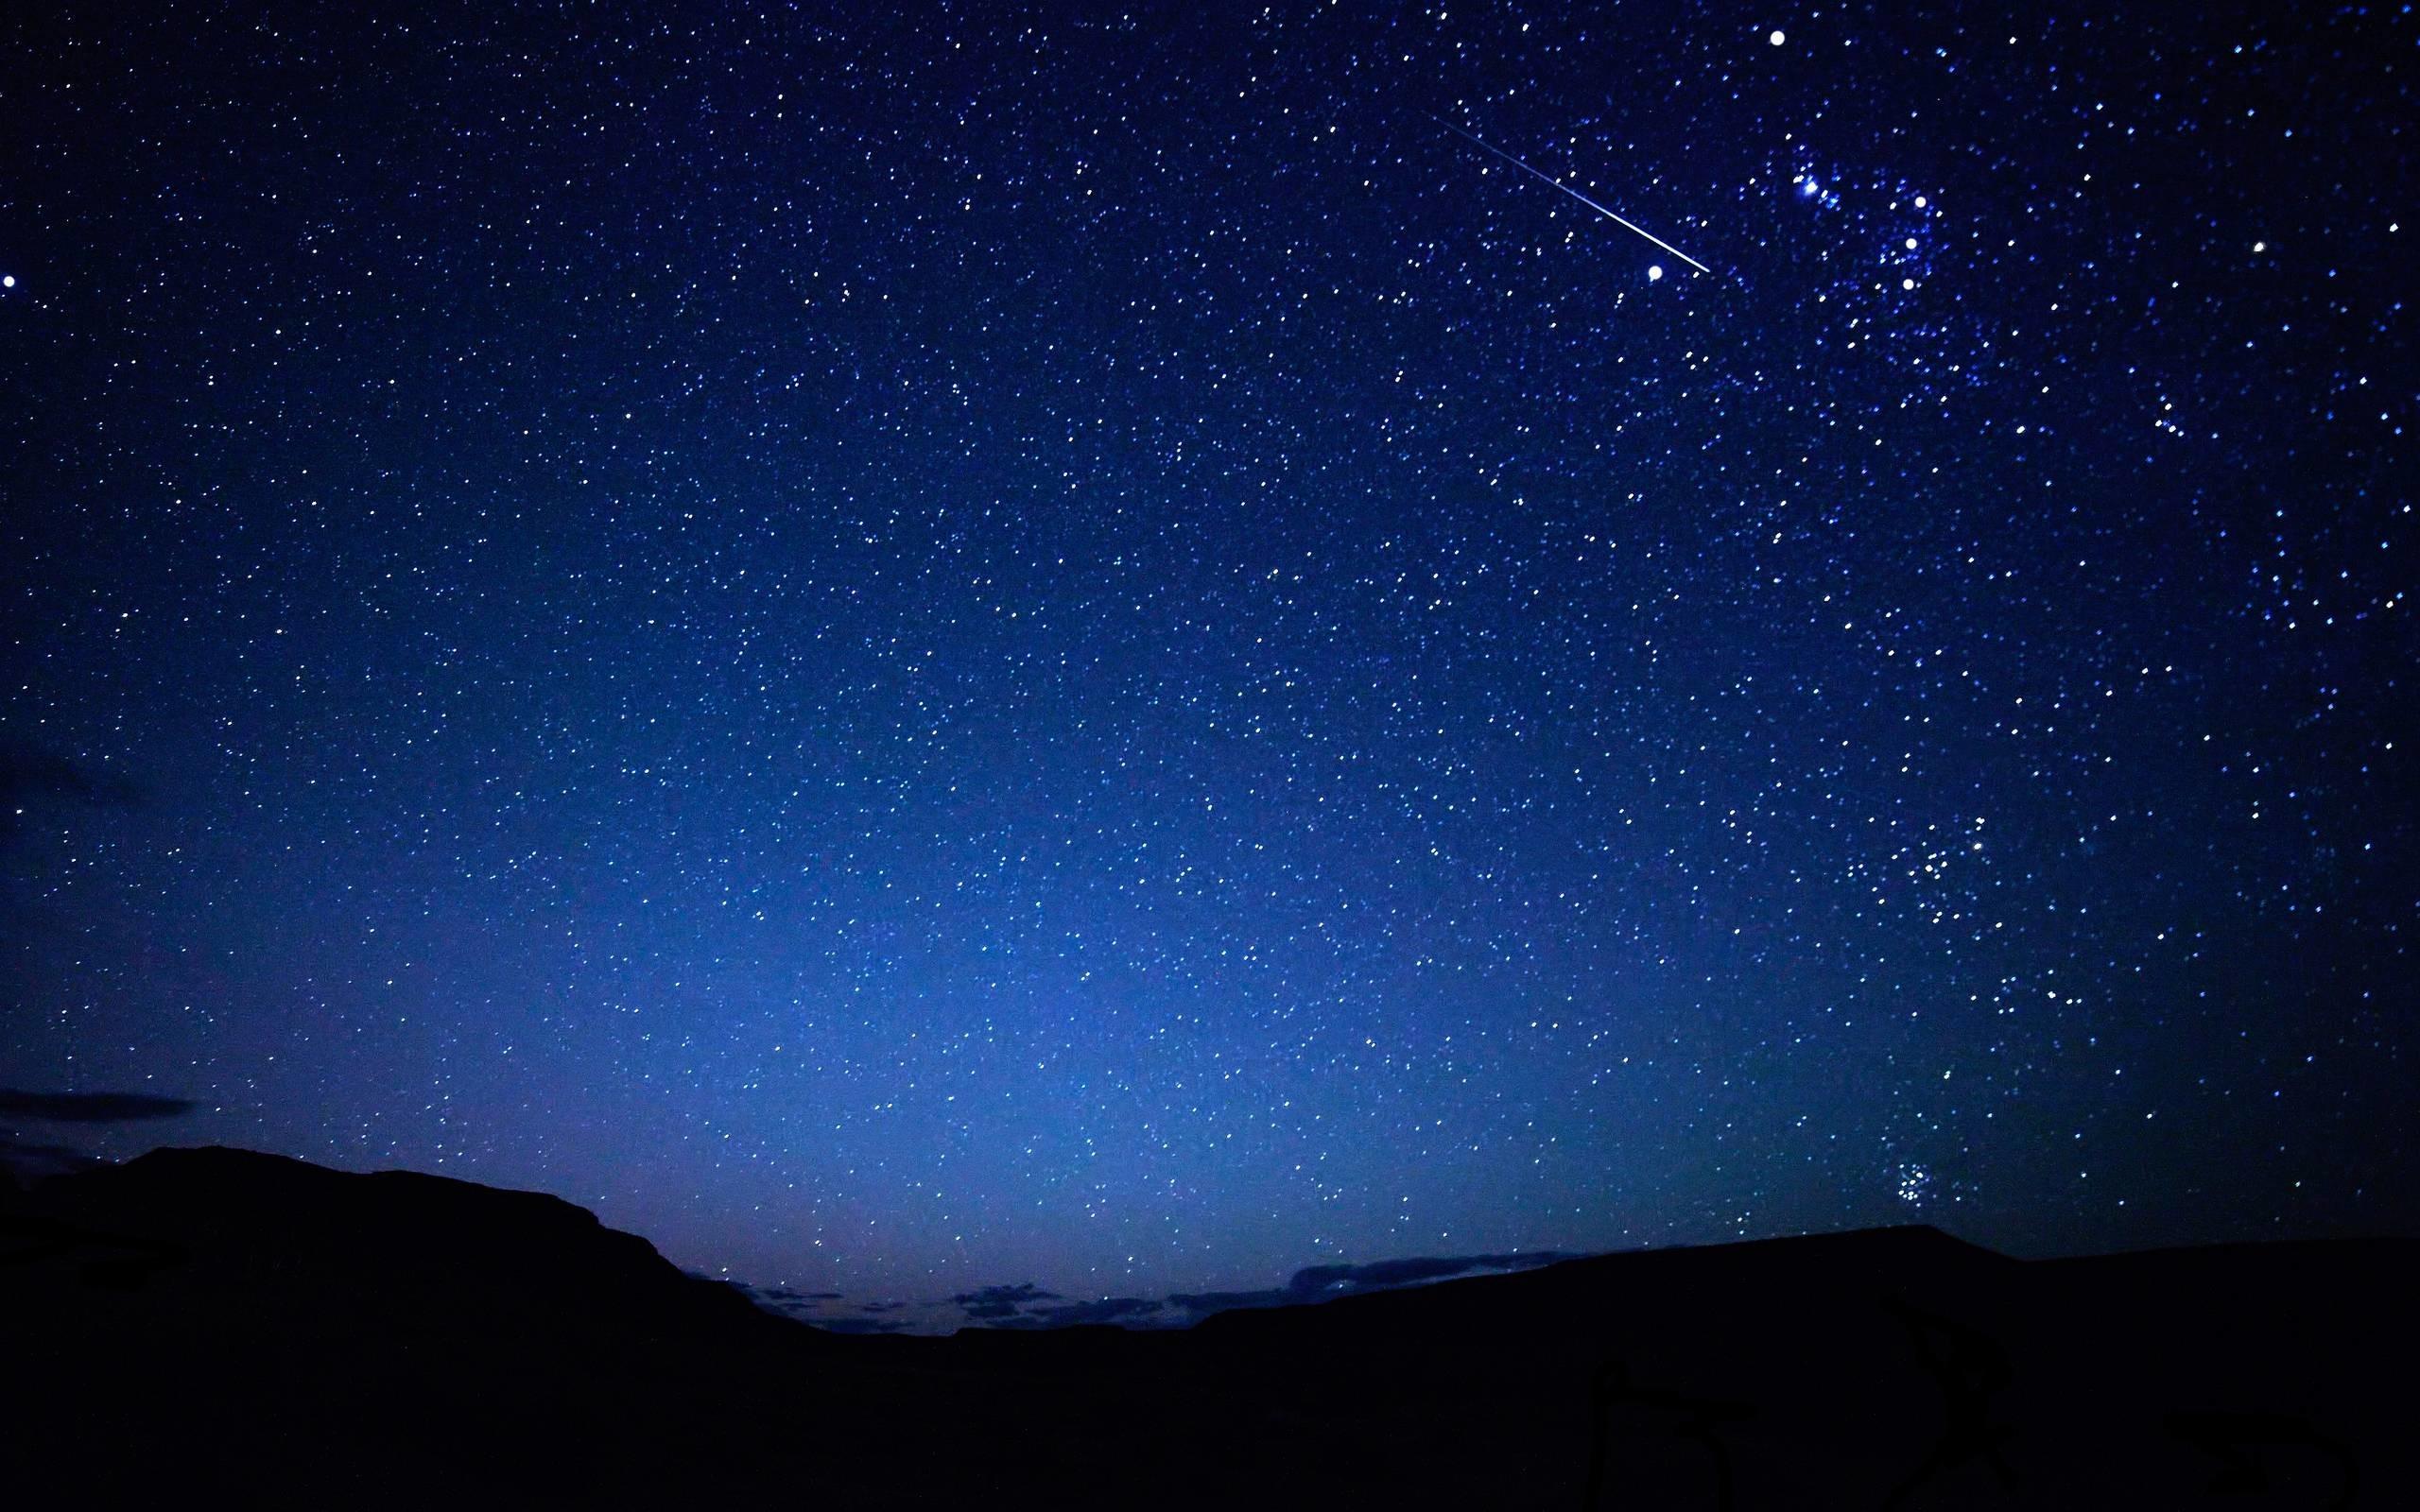 Beautiful Night Sky Wallpaper 66 images